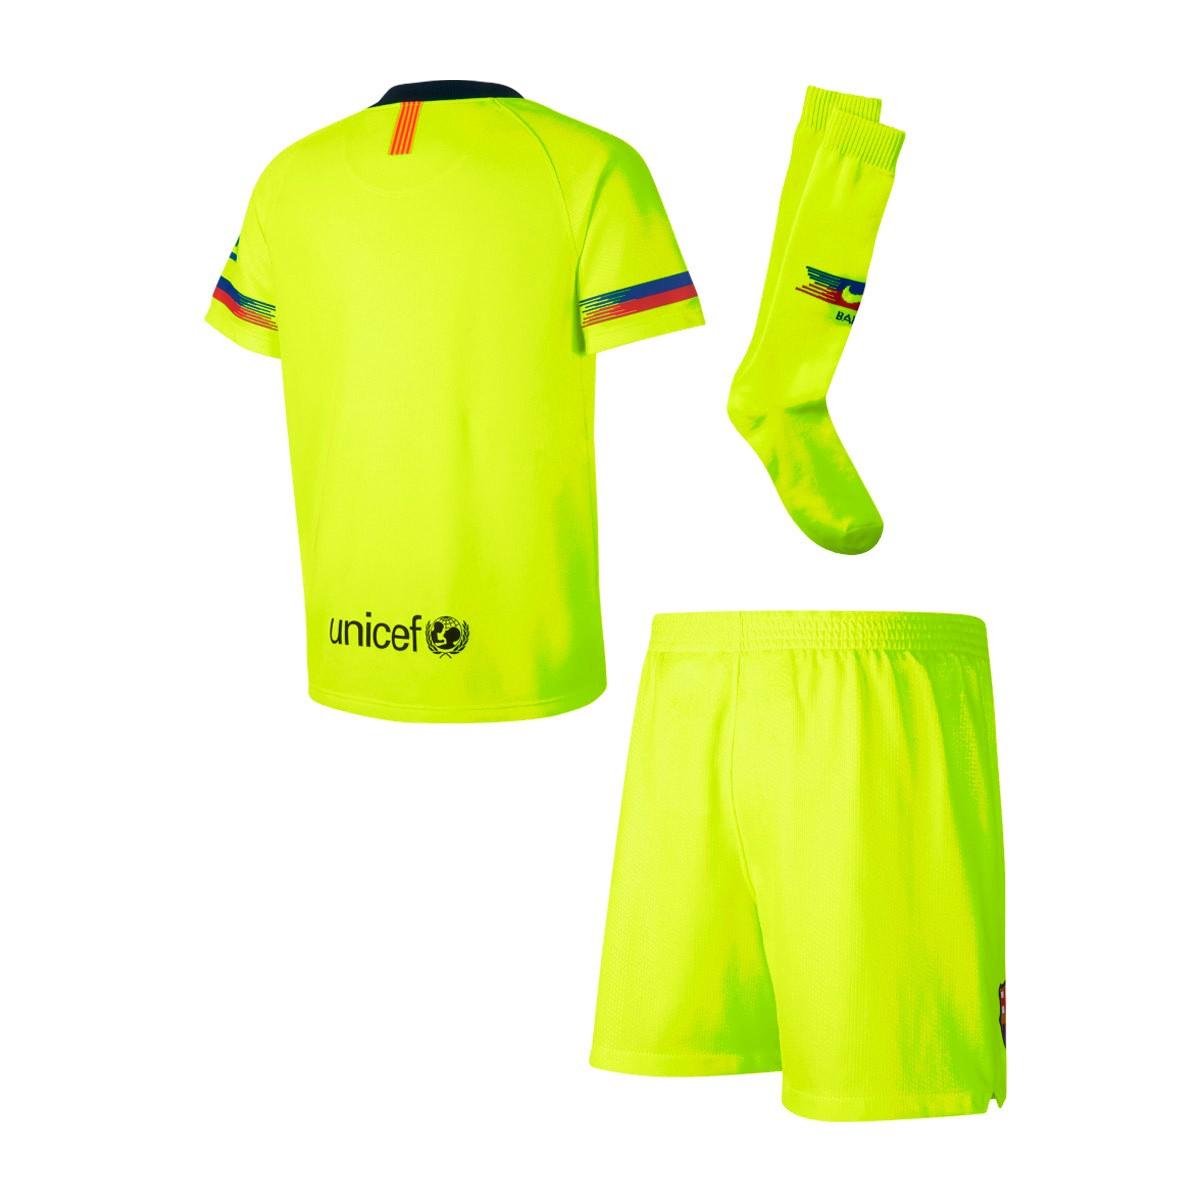 f80f8a3215 Kit Nike Kids FC Barcelona 2018-2019 Away Volt-Deep royal blue - Football  store Fútbol Emotion